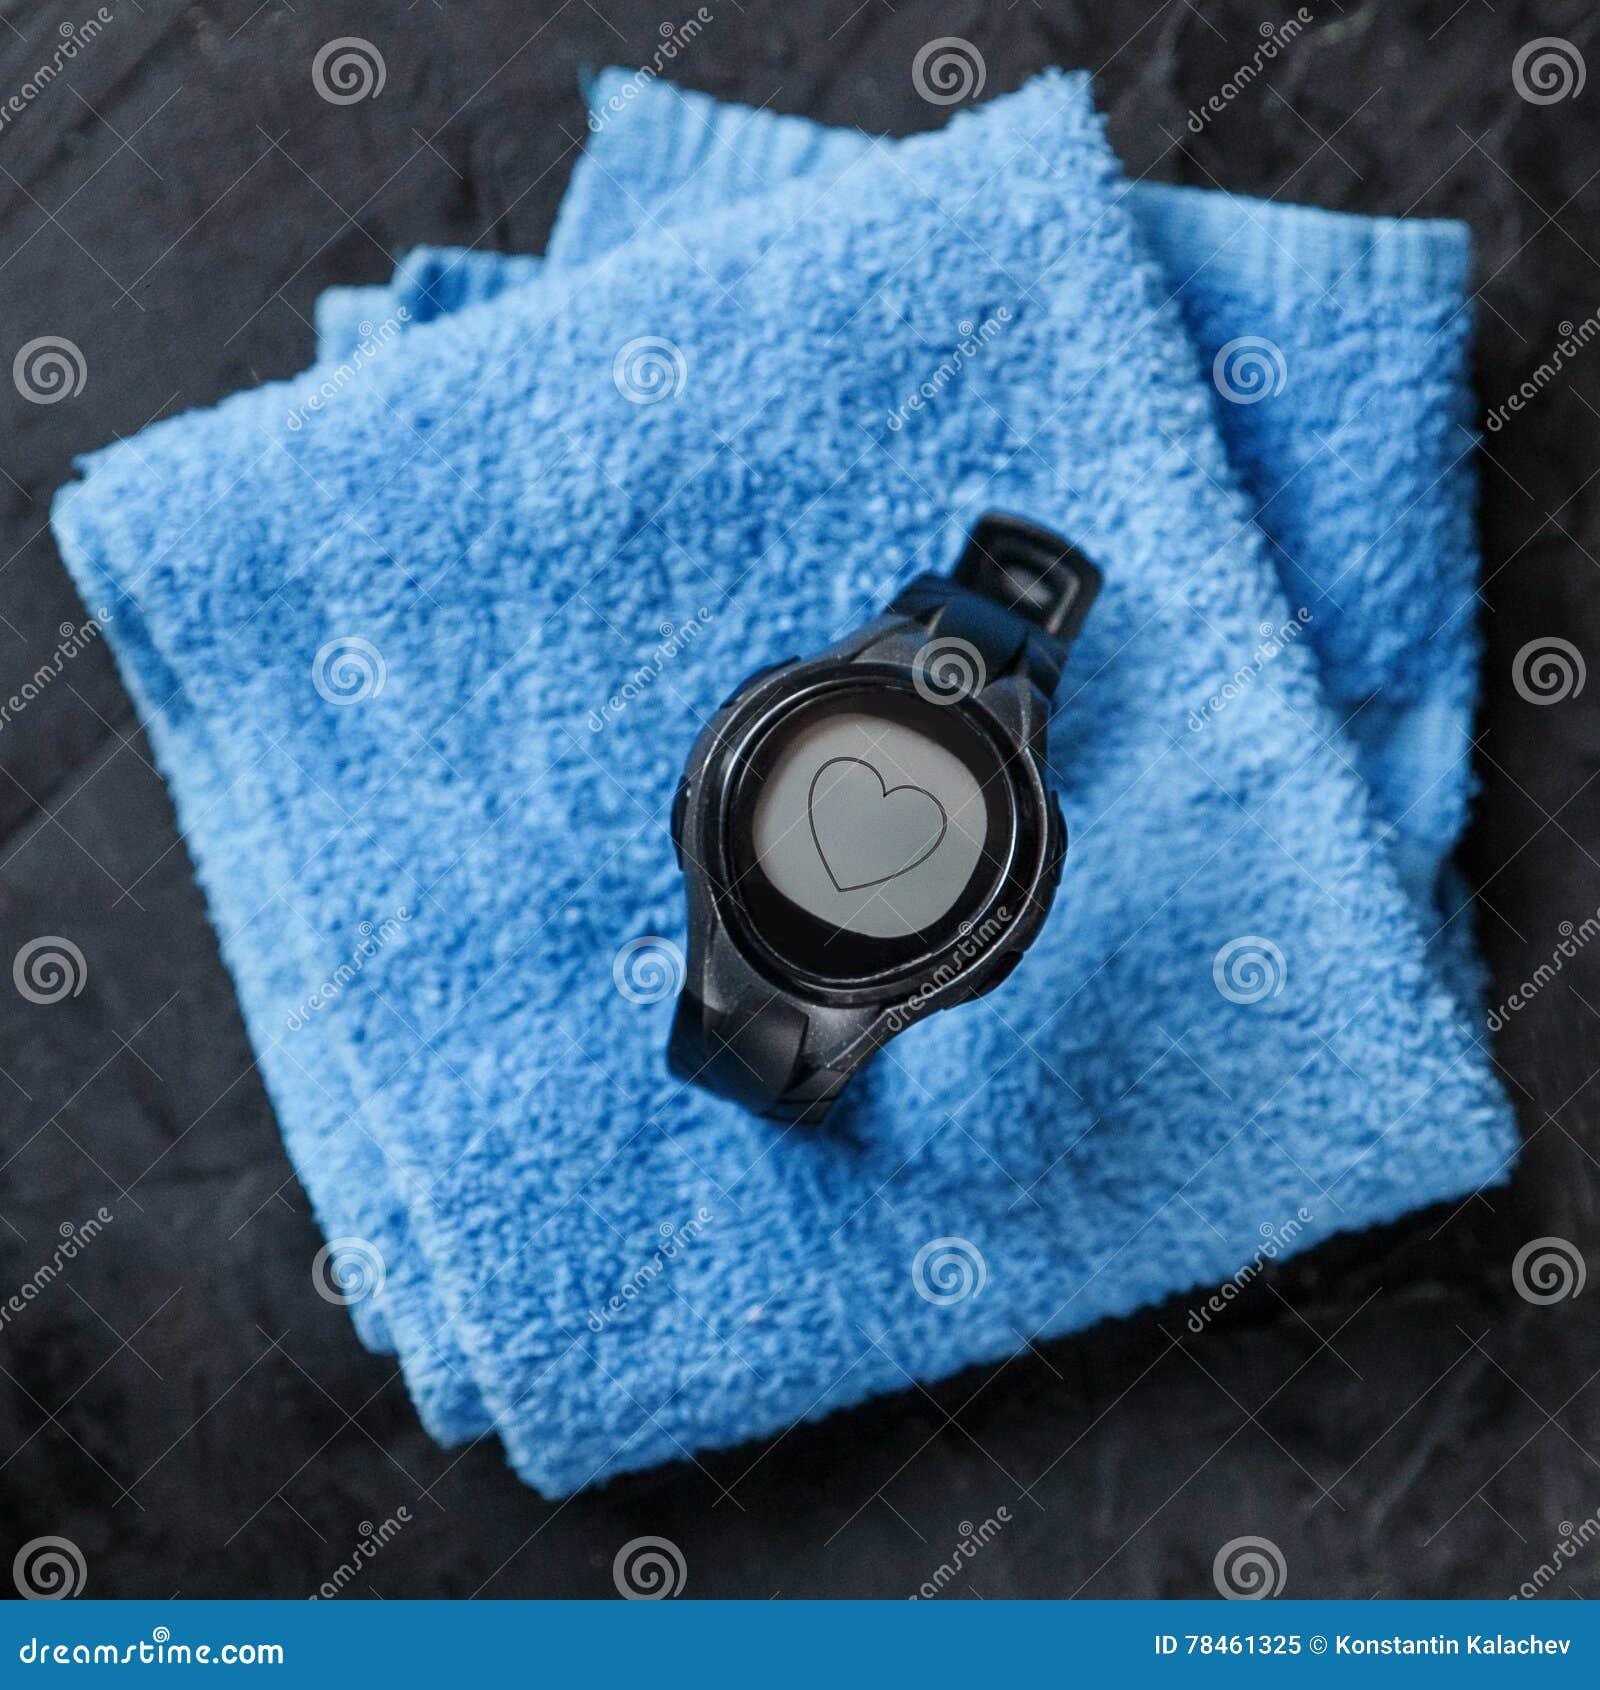 Монитор тарифа сердца на голубом полотенце около футбольного мяча